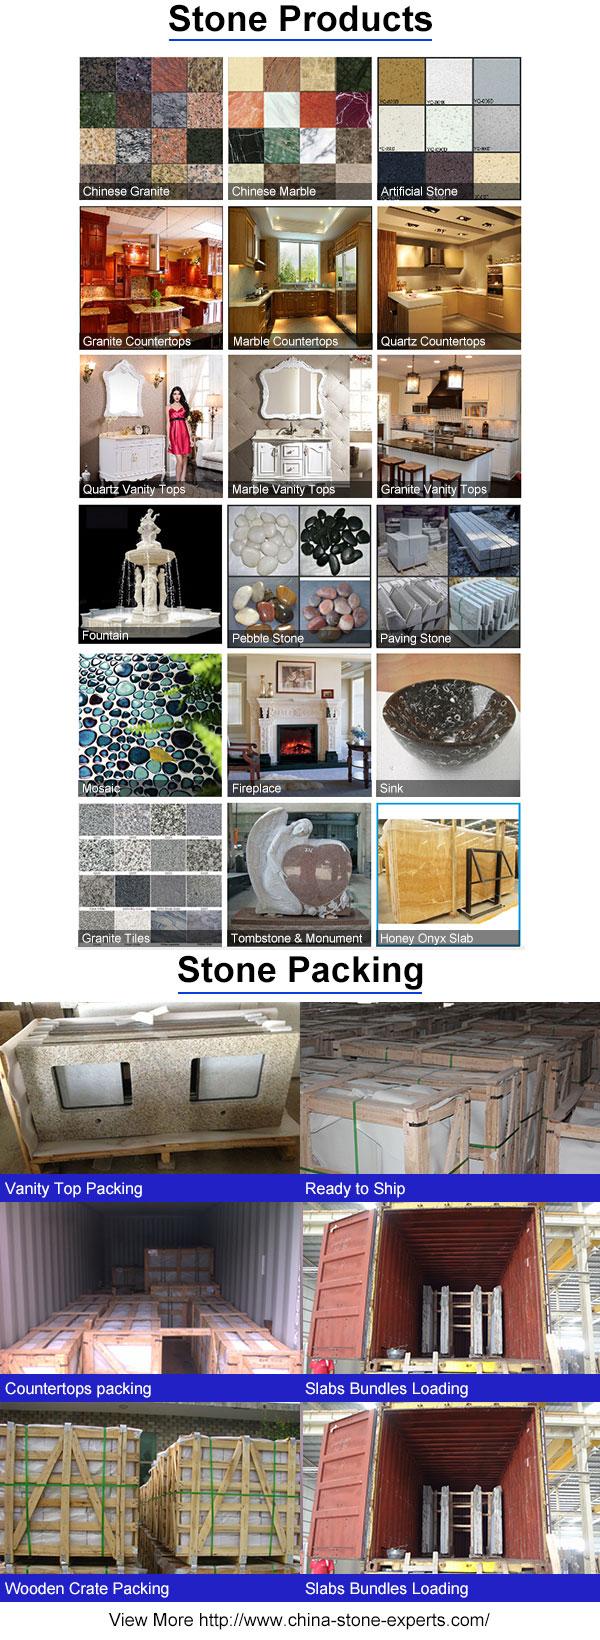 Roman Travertine Slab for Hotel Floor or Wall Tile